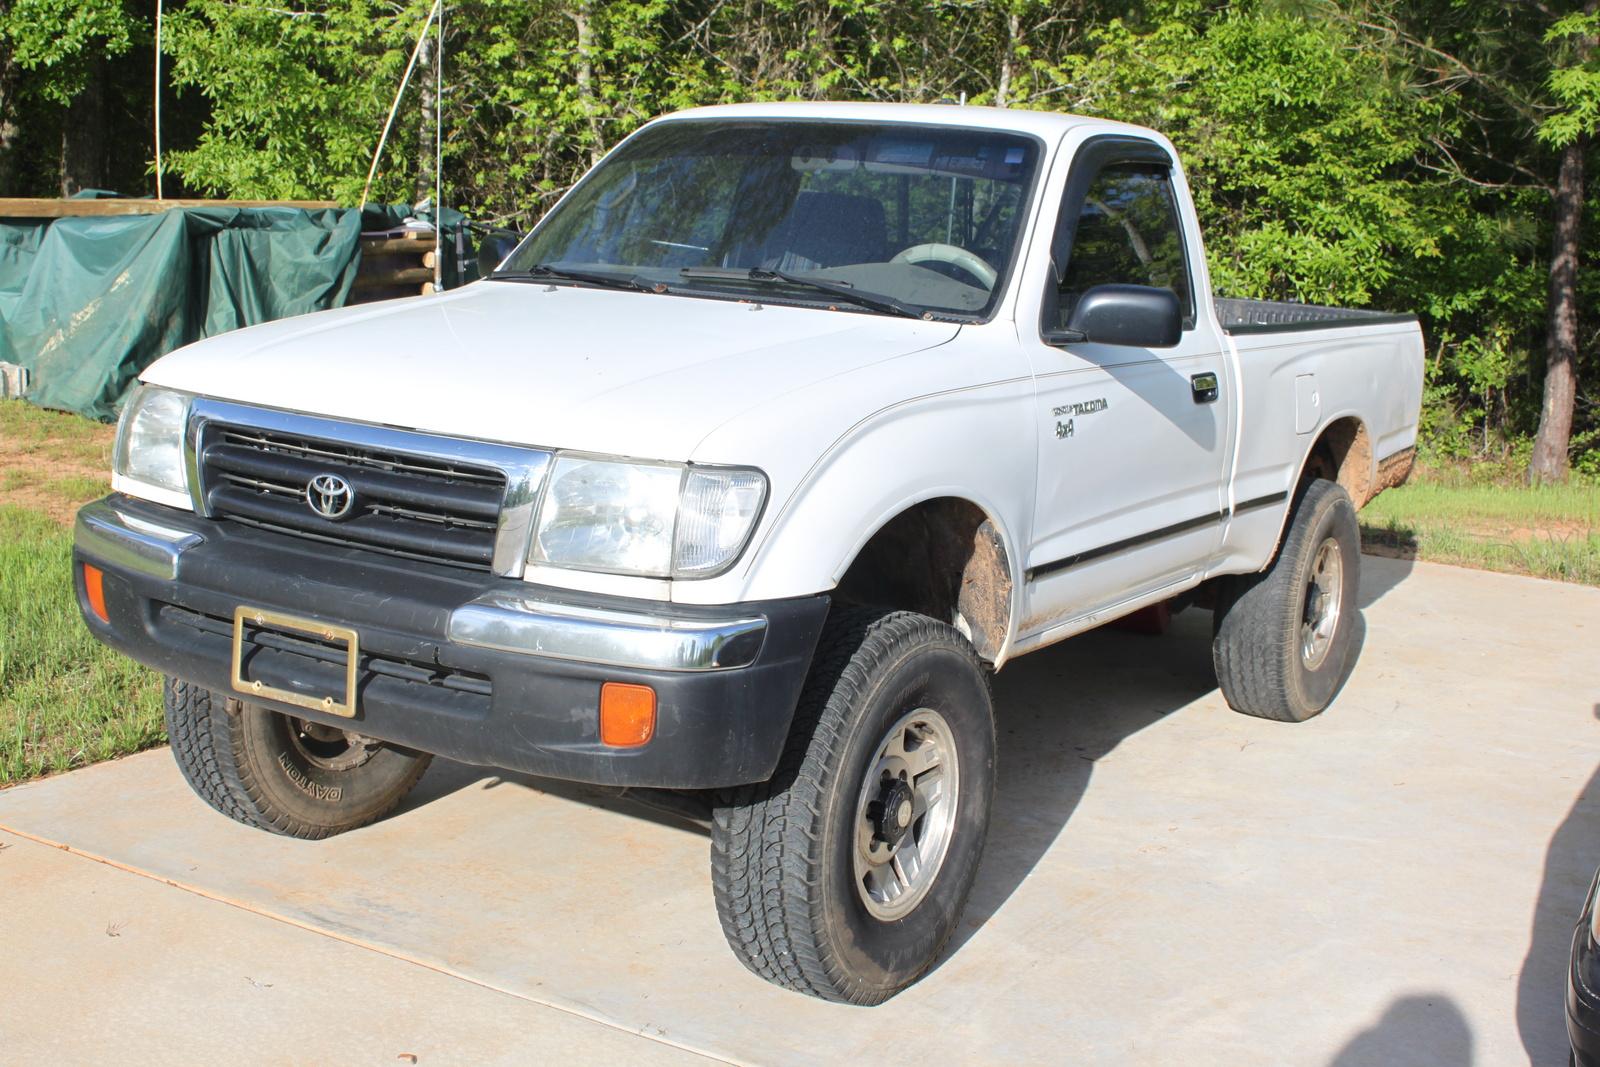 2000 Toyota Tacoma Pictures Cargurus